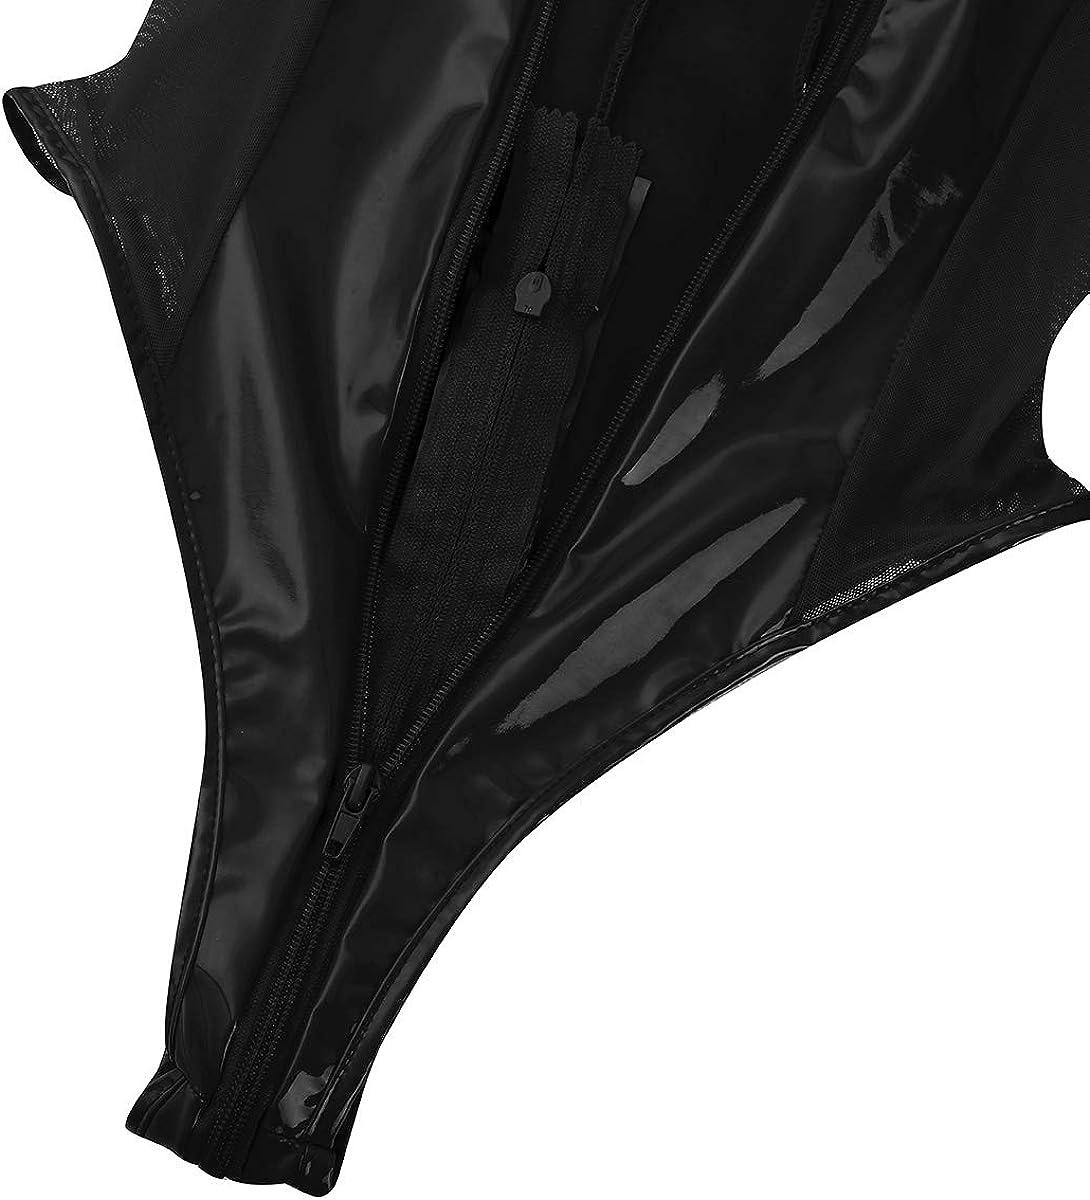 iixpin Women Wetlook Patent Leather See Through Mesh Splice Zipper Open Crotch High Cut Thong Bodysuit Swimsuit